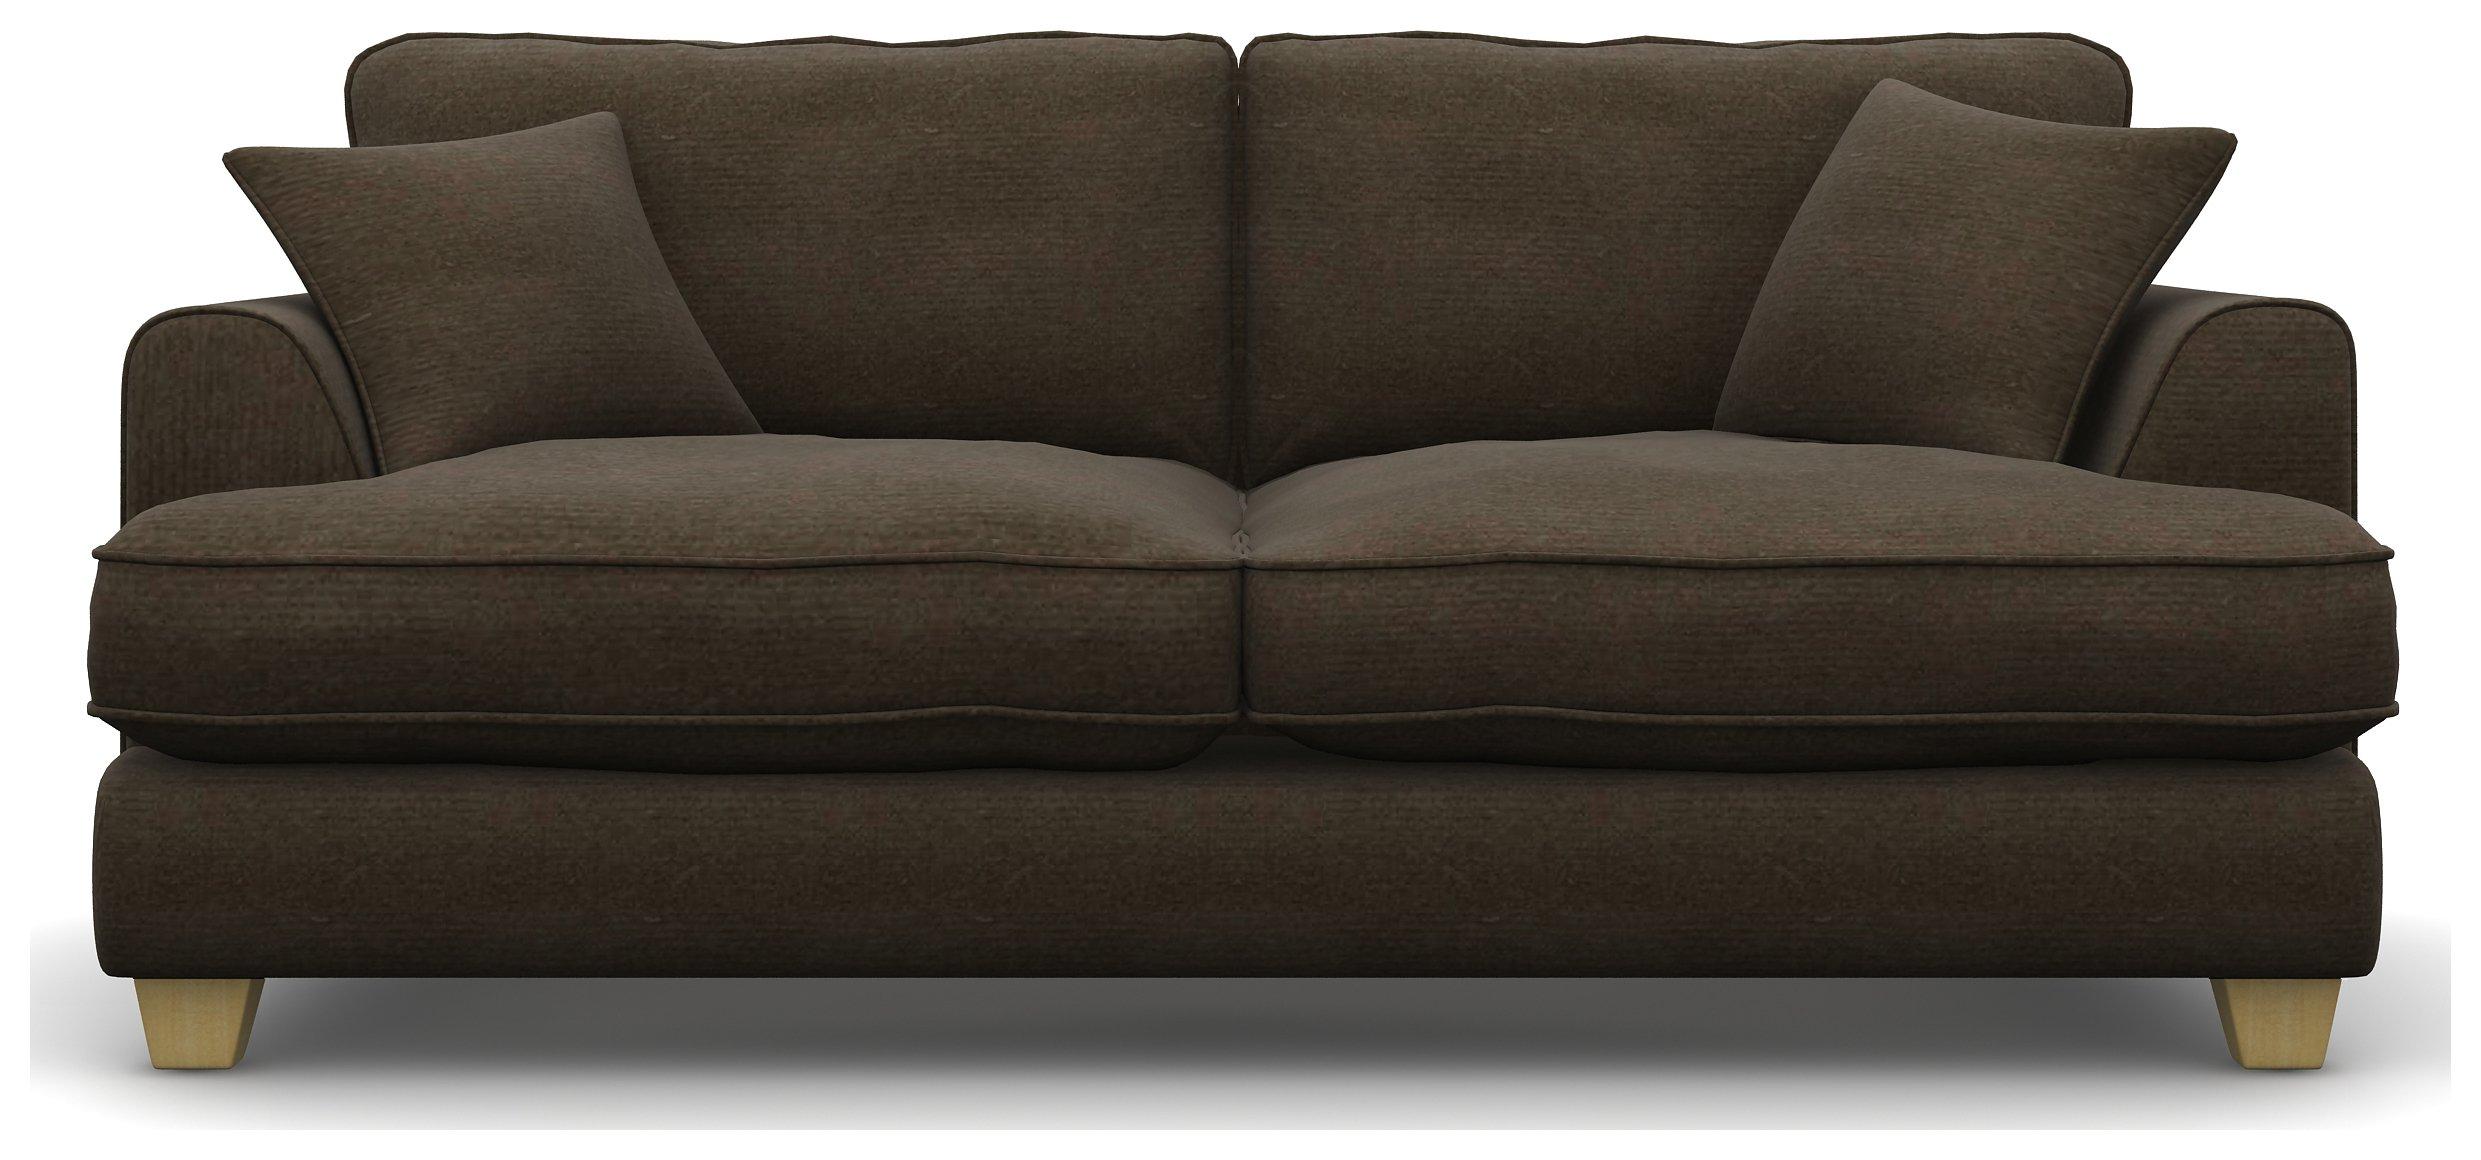 Heart of House Hampstead 3 Seater Fabric Sofa - Teak Brown